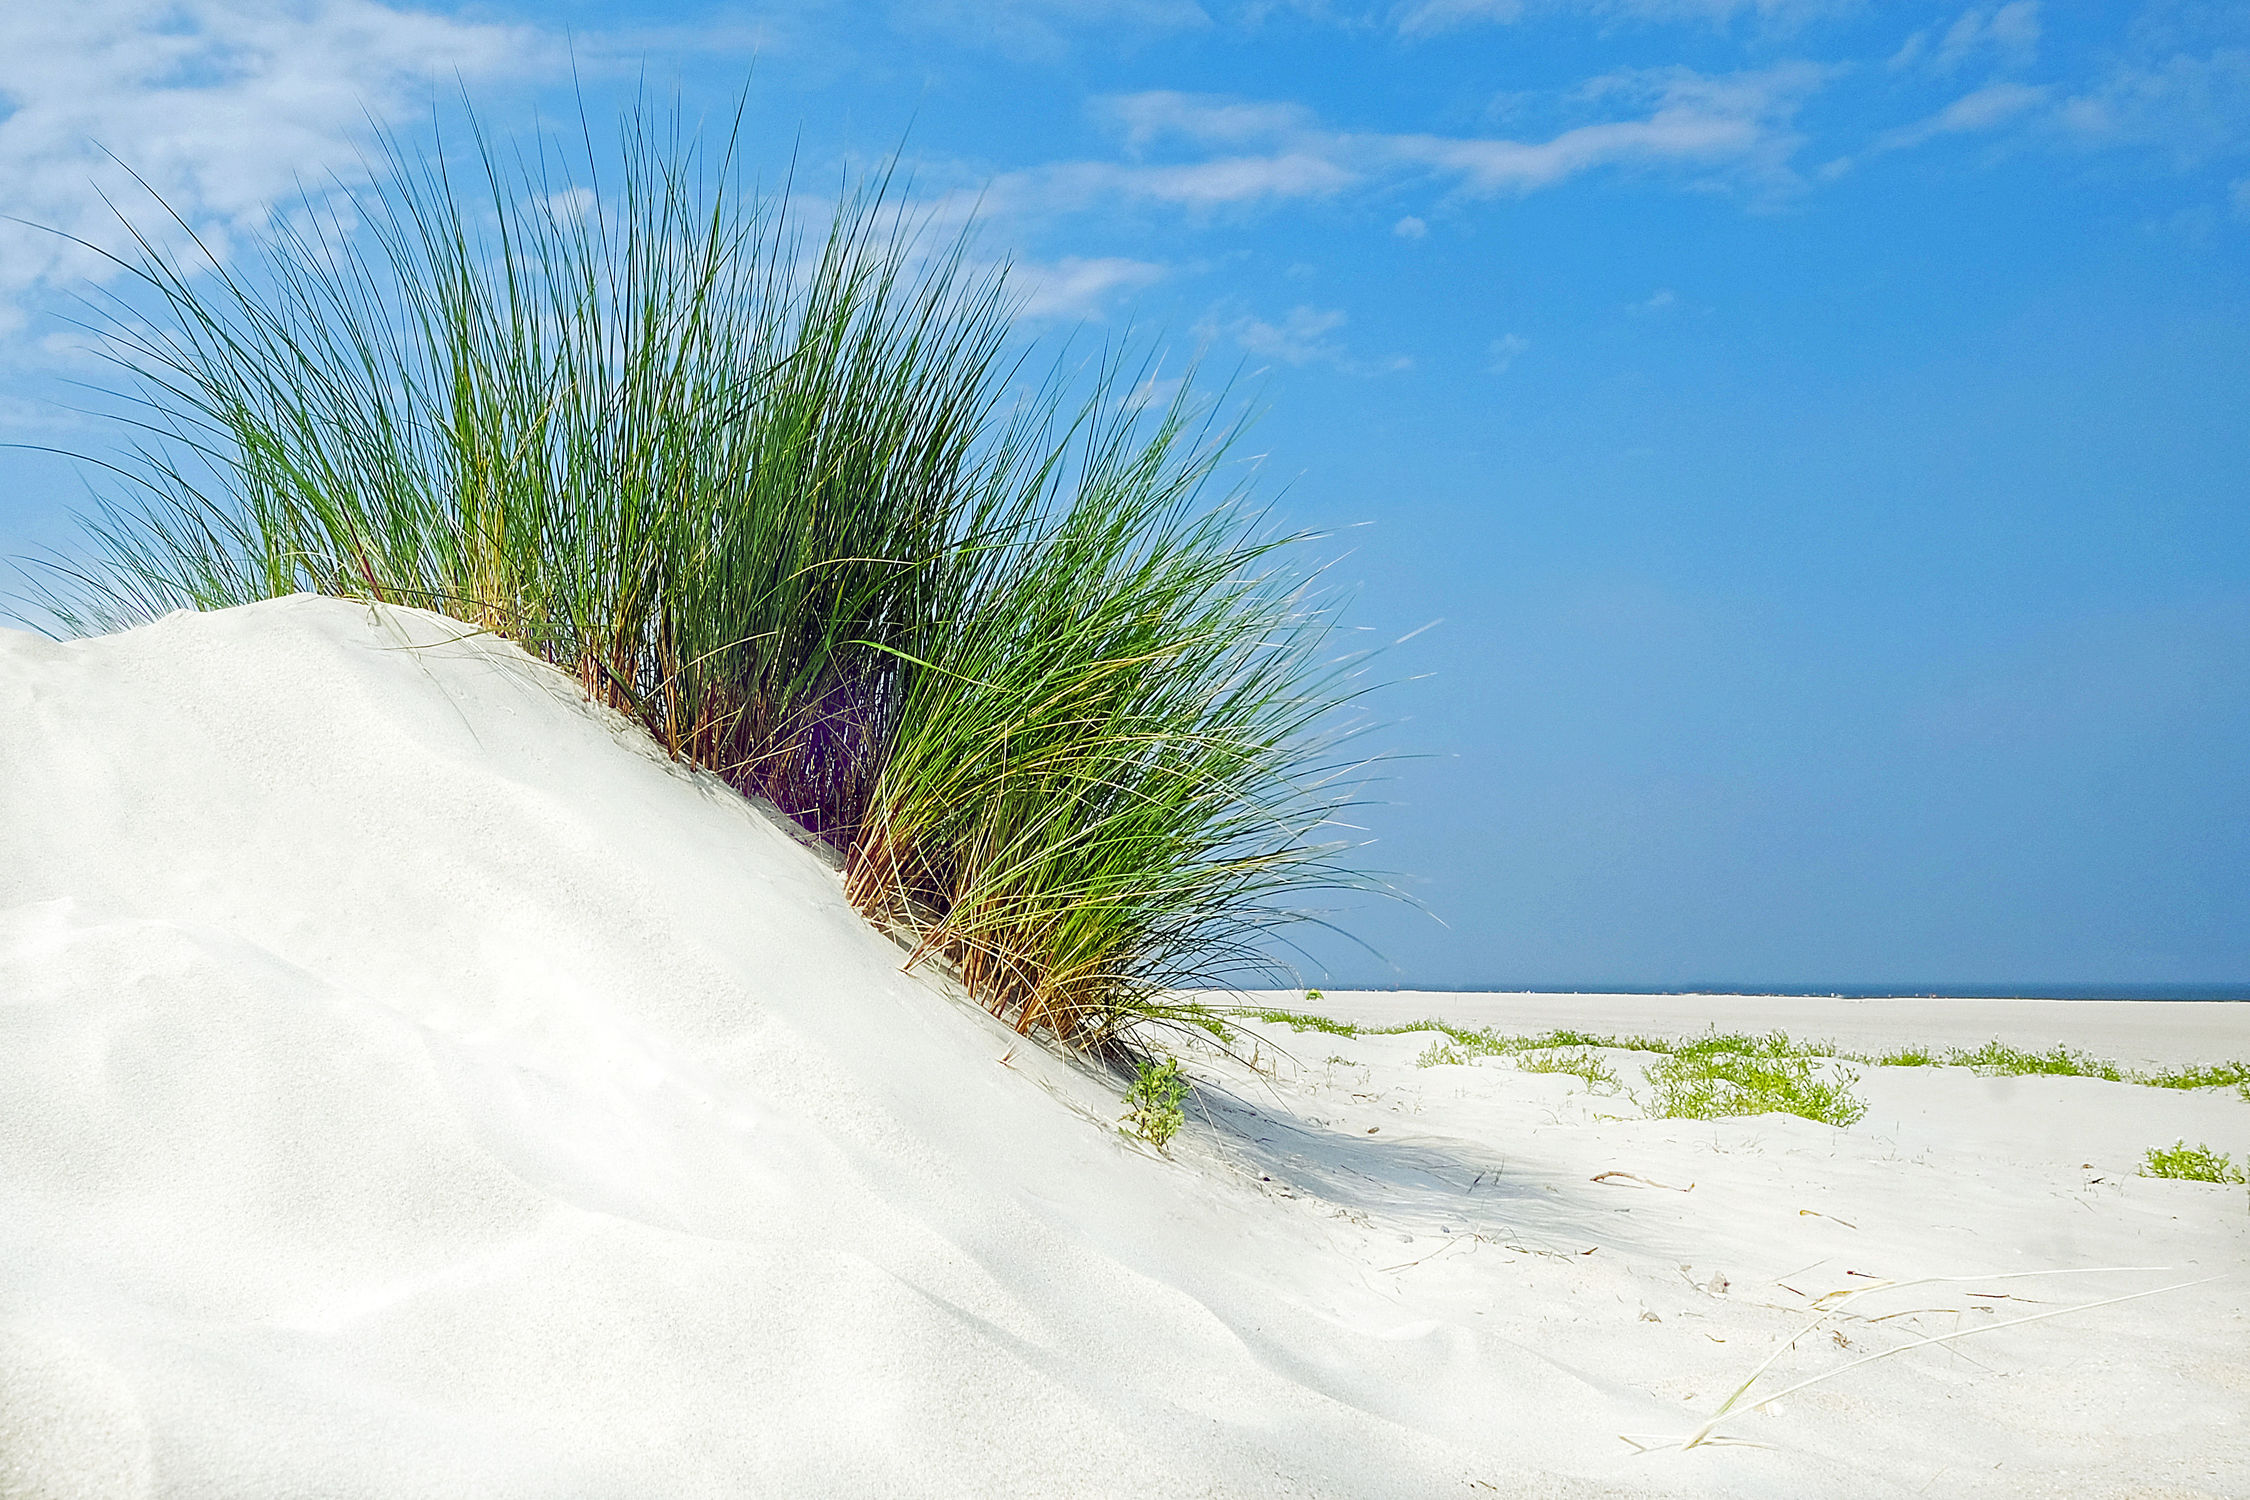 Bild mit Sonne, Strand, Meerblick, Meer, Dünen, Dünengras, Küste, Ostfriesland, Sanddünen, Norderney, Feiner_Sand, Ostfriesische_ Inseln, Windstille